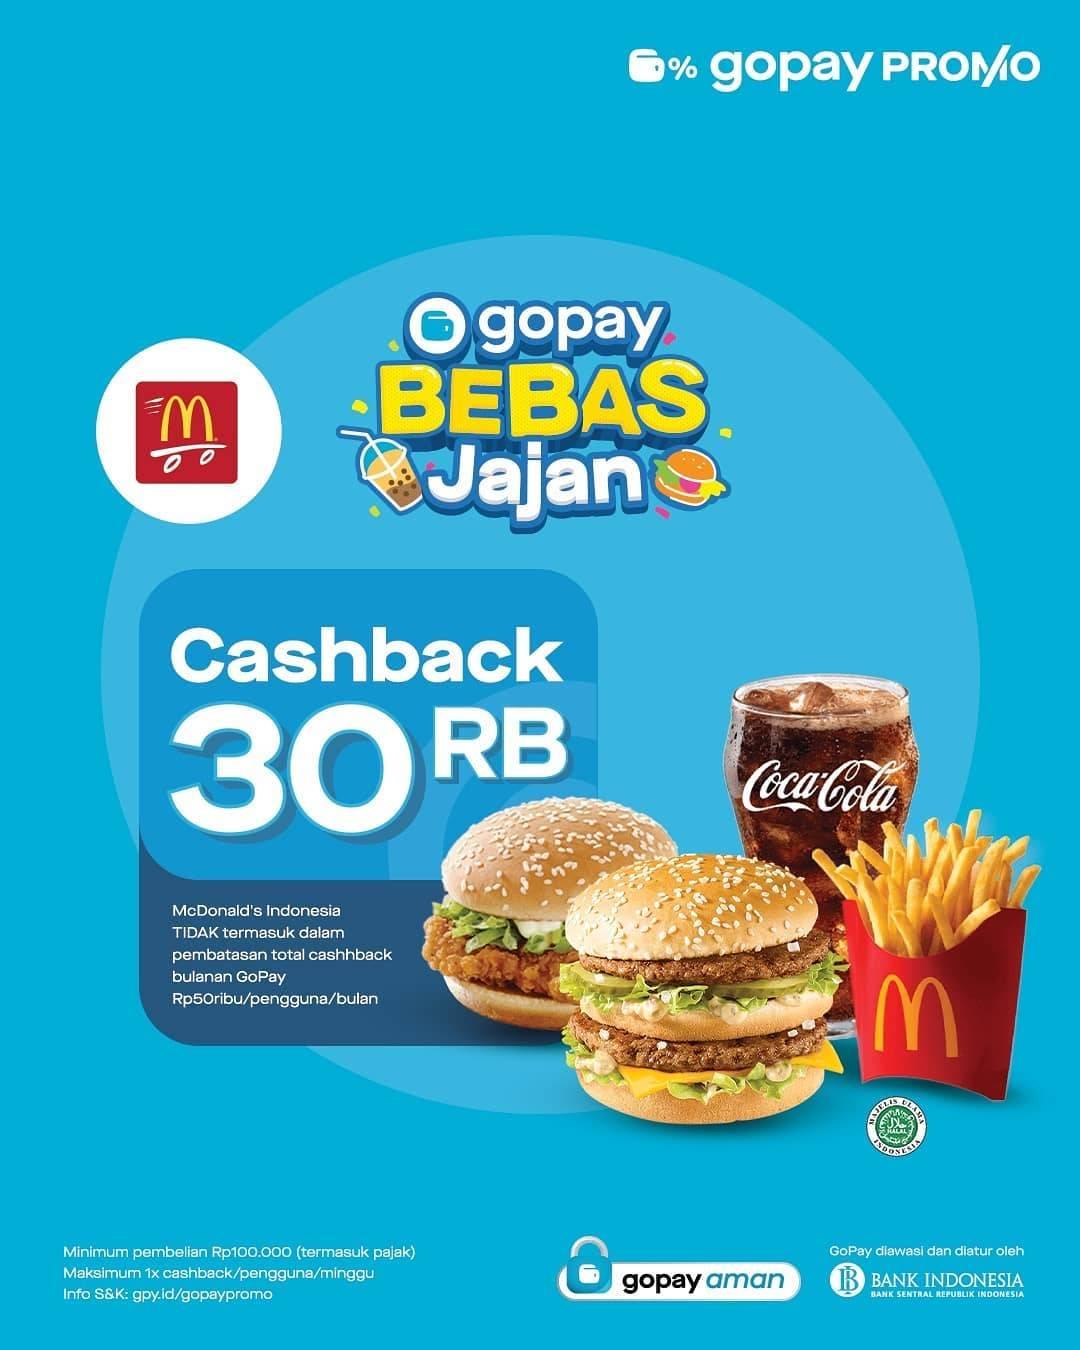 Diskon McDonalds Cashback Hingga Rp. 30.000 Dengan Gopay